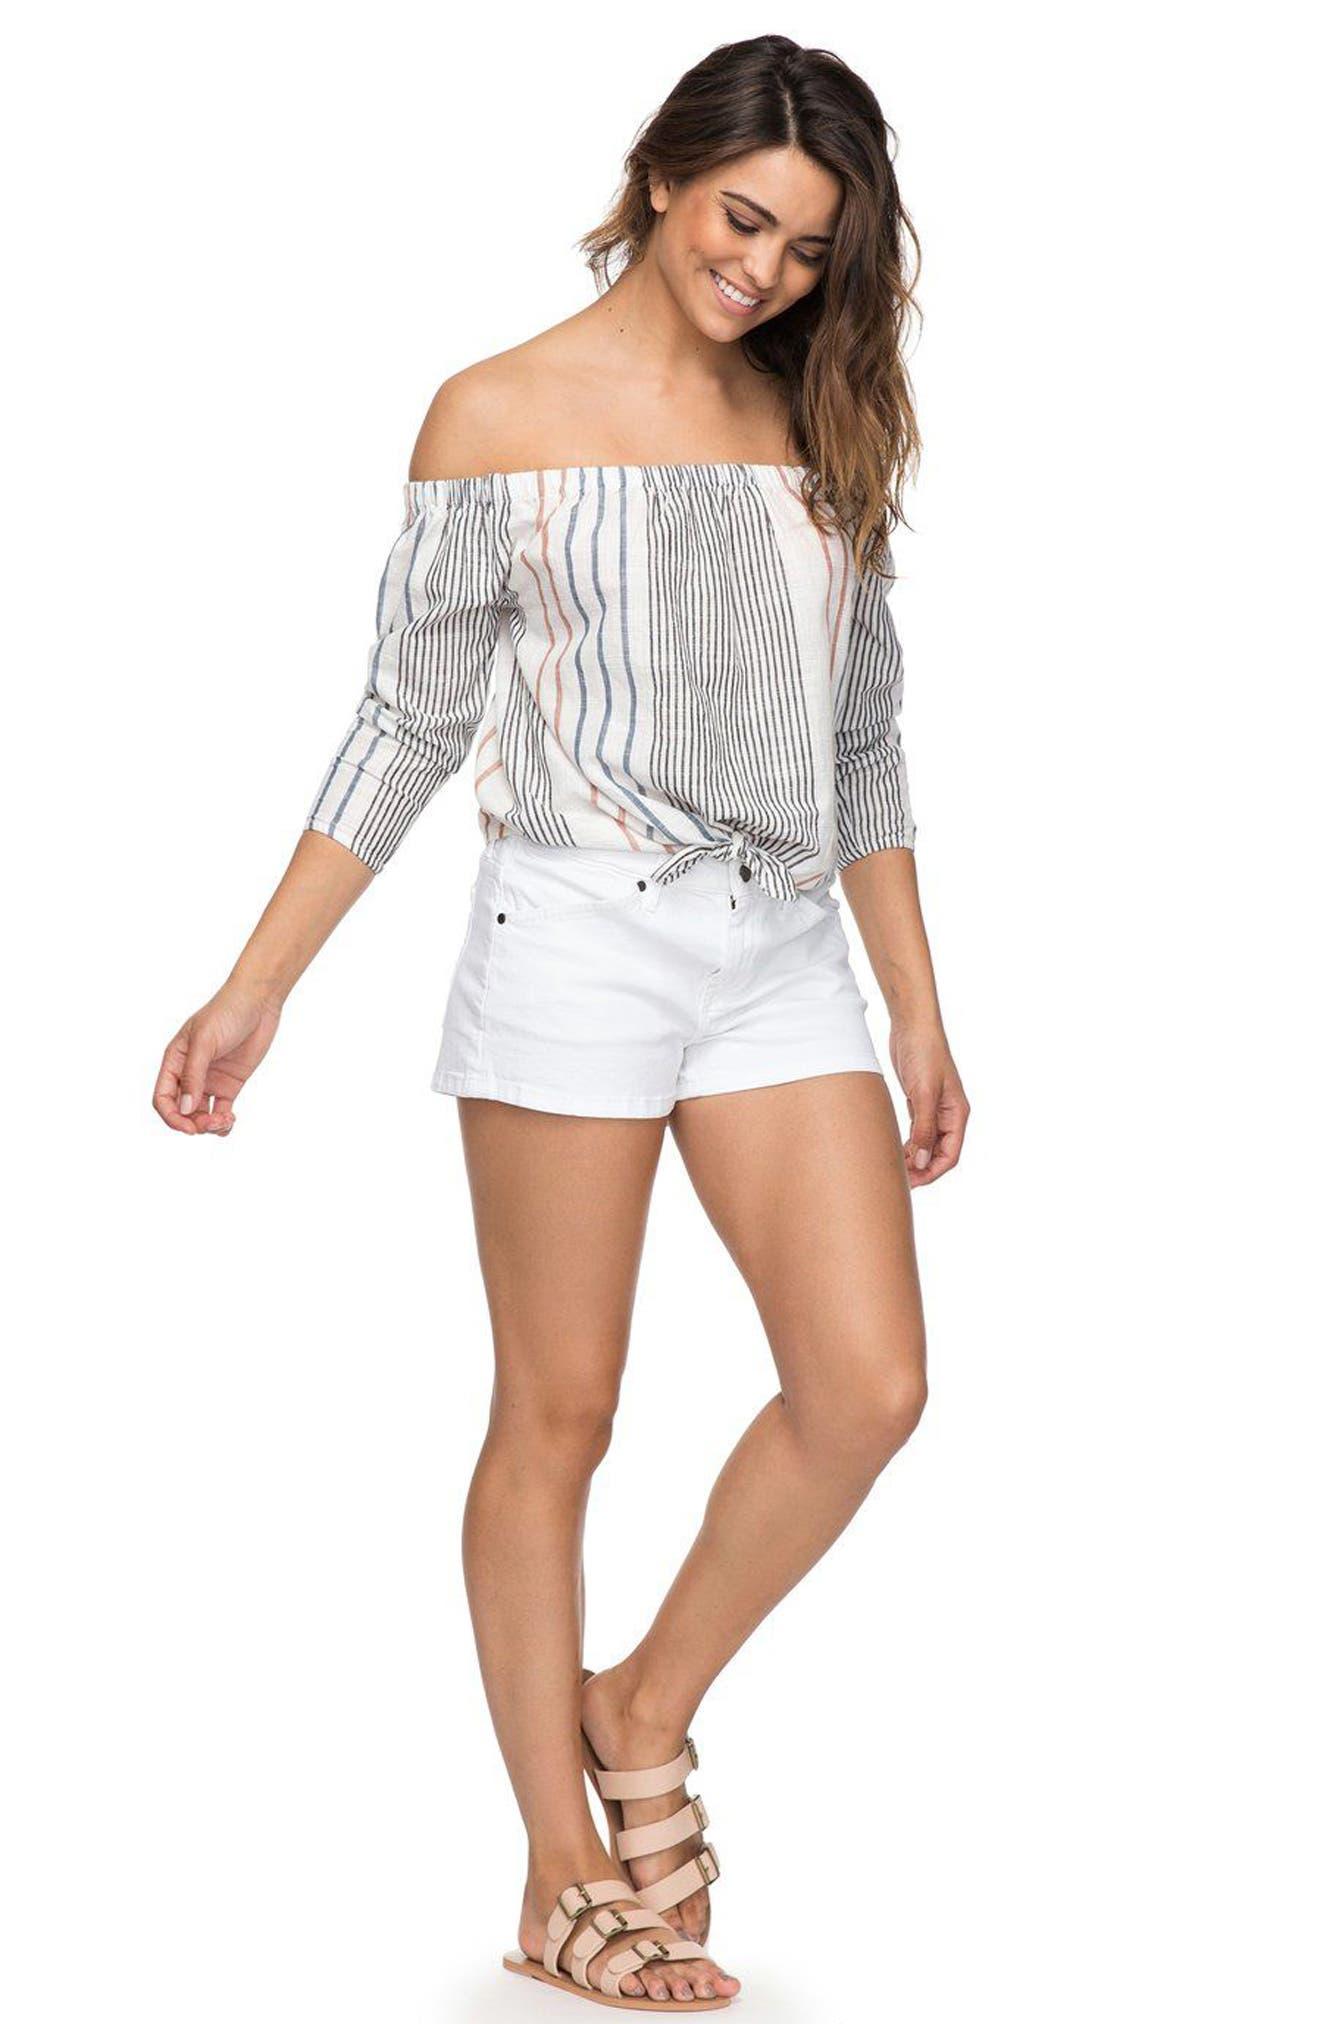 Seatripper Denim Shorts,                             Alternate thumbnail 2, color,                             White